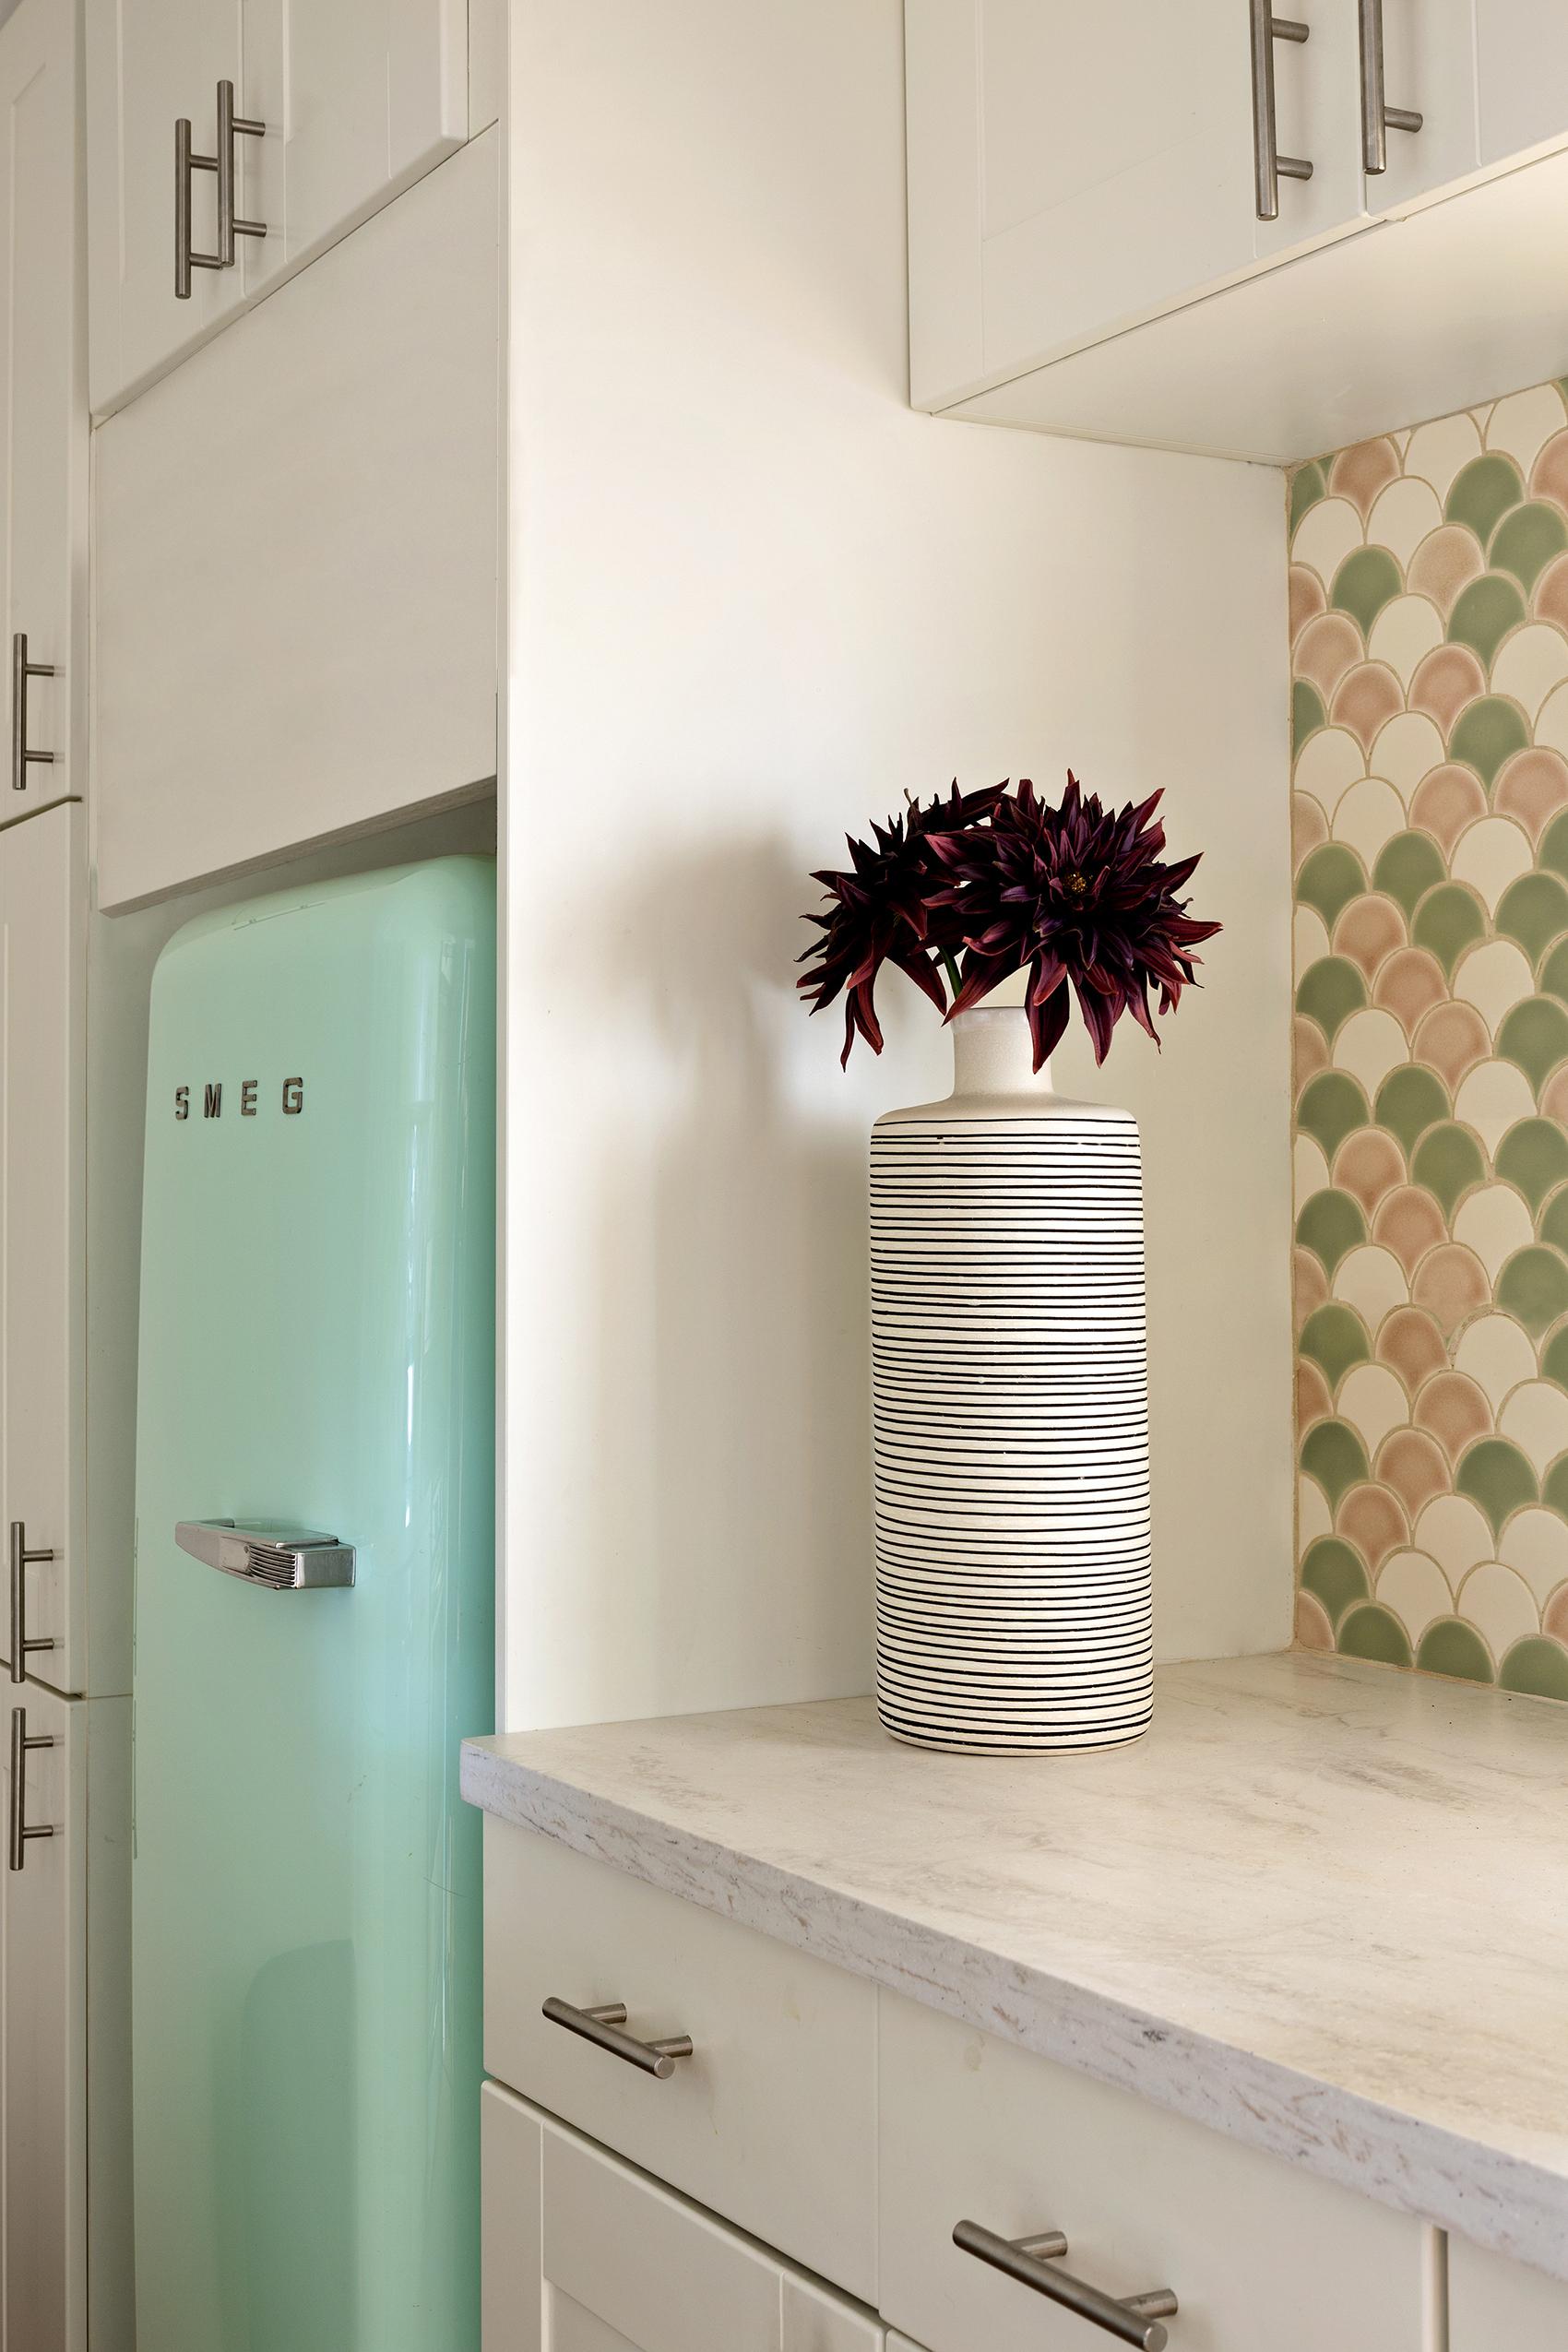 Smeg refrigerator and custom tiles for kitchen.